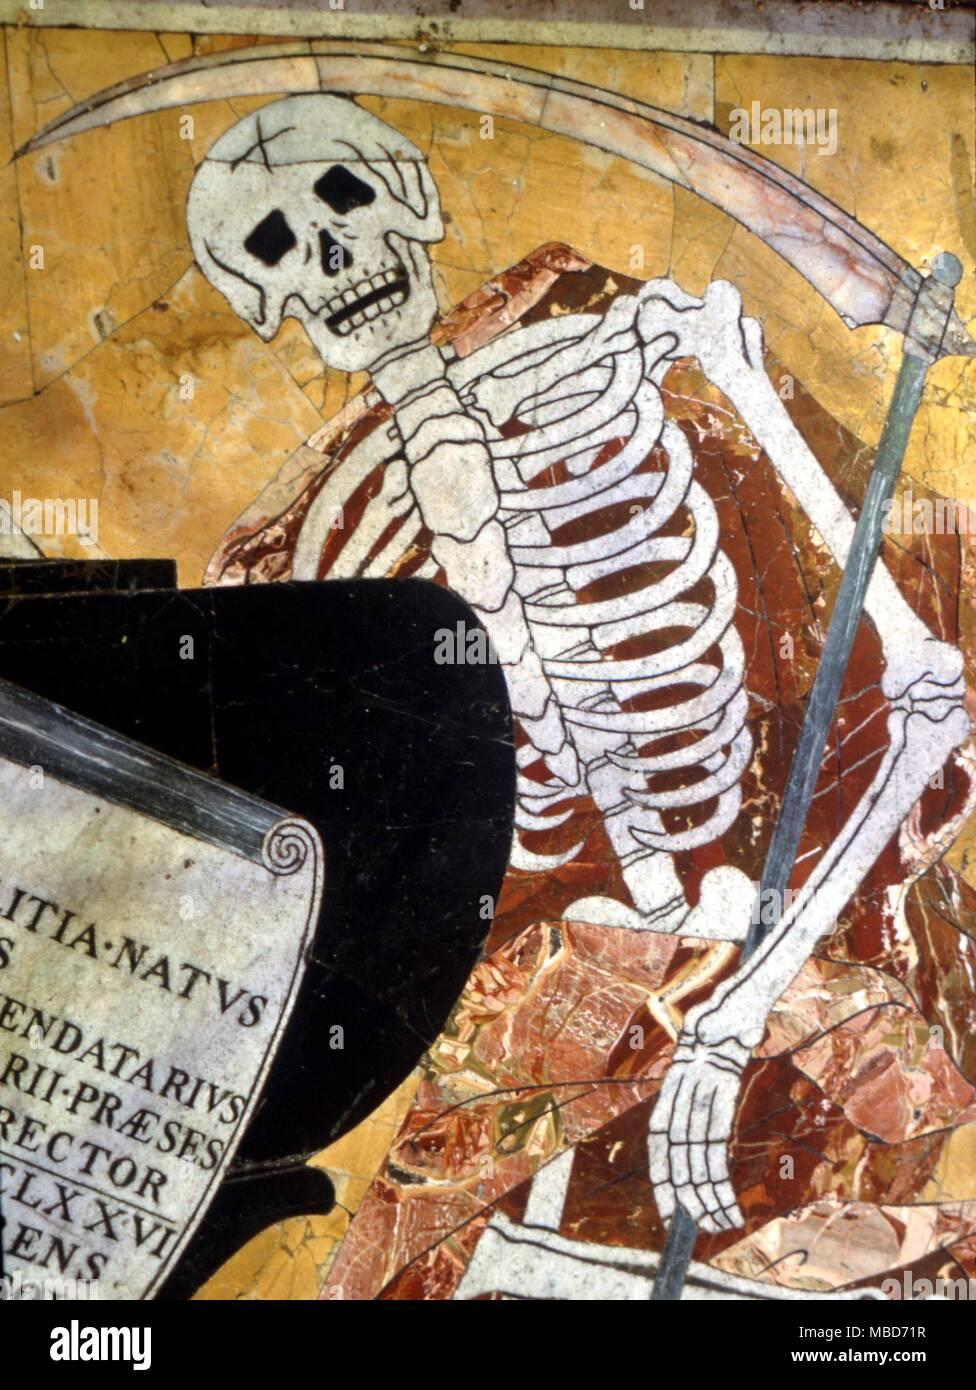 Muerte - esqueleto en mármol, desde el magnífico pavimento de mármol de la Catedral de St John, Valetta, Malta - Siglo XVIII Imagen De Stock